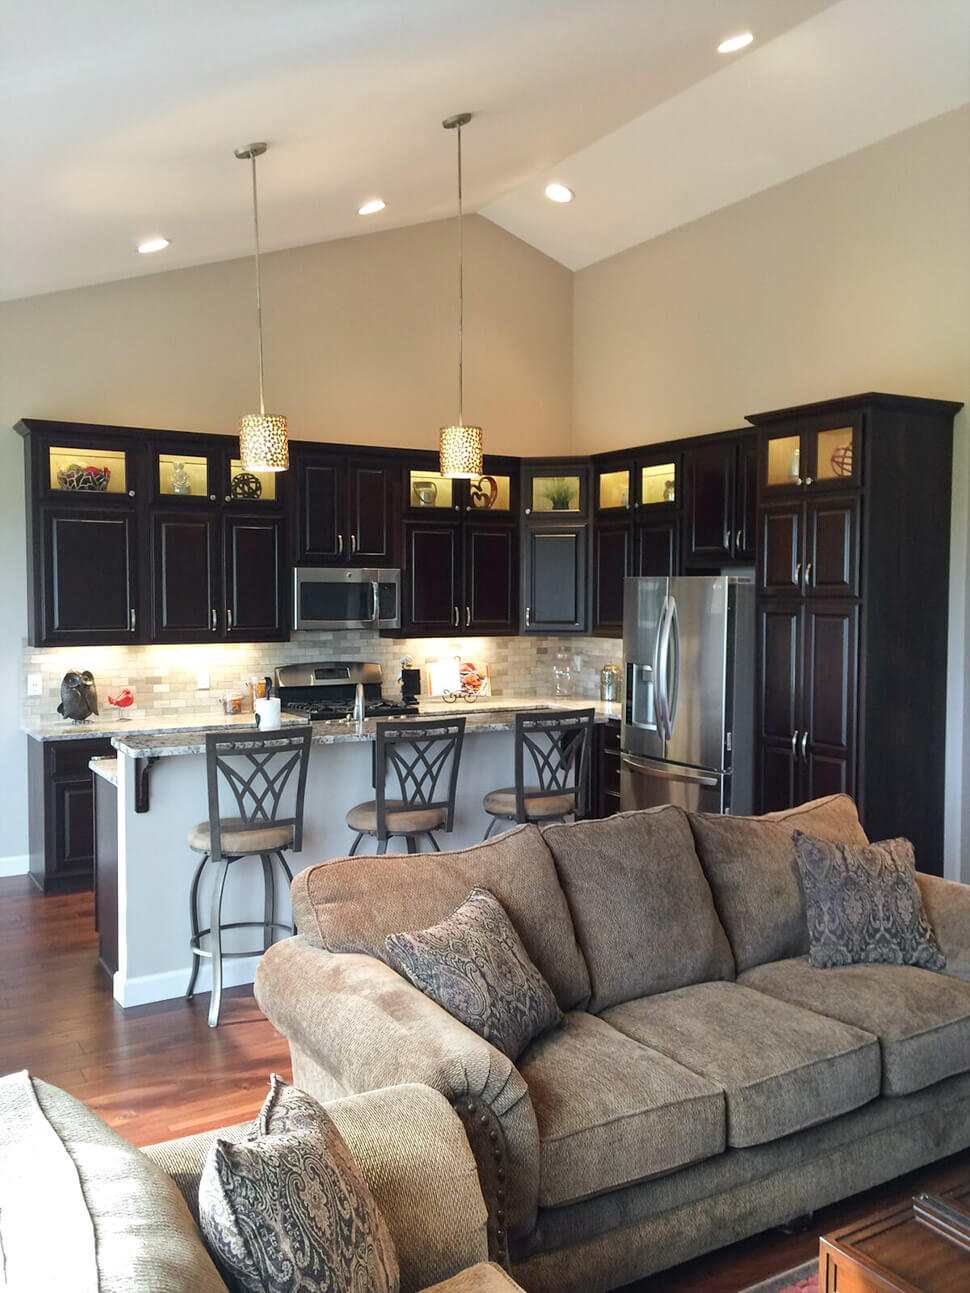 Kitchen - the Adams floor plan - 2120sq ft - 2015 Parade